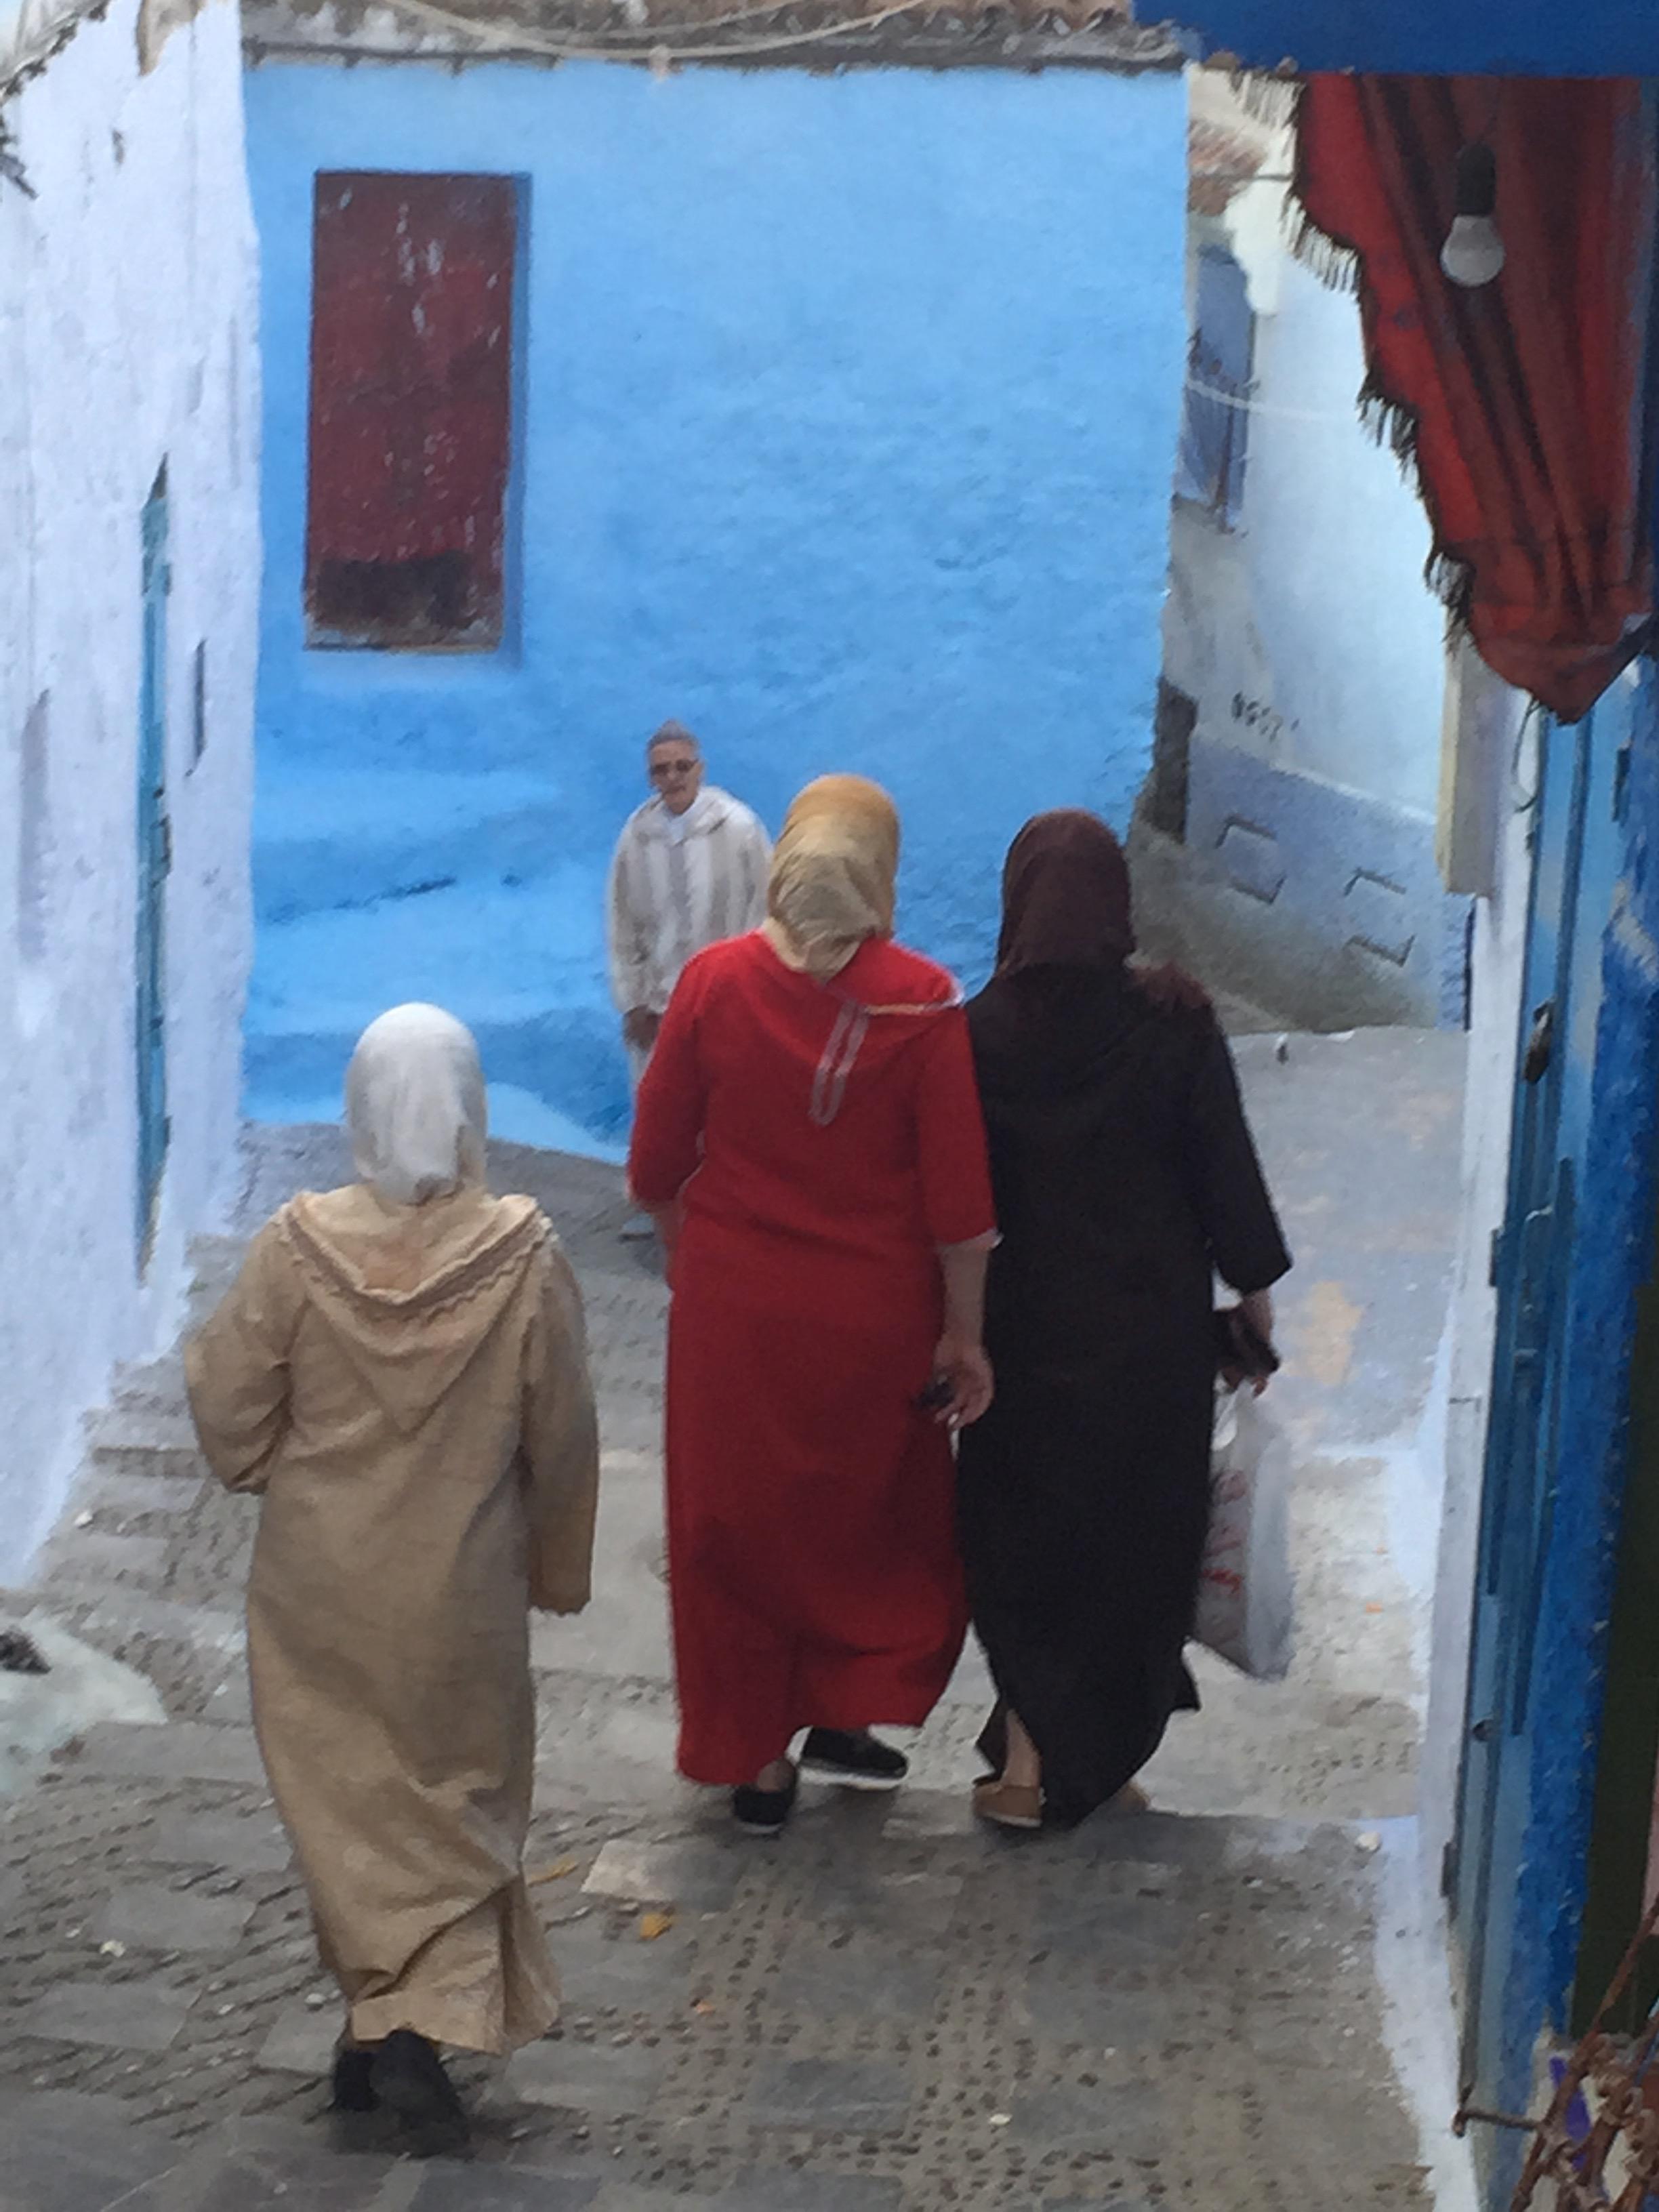 Moroccan women taking a stroll thru Chefchaouen, the Blue City